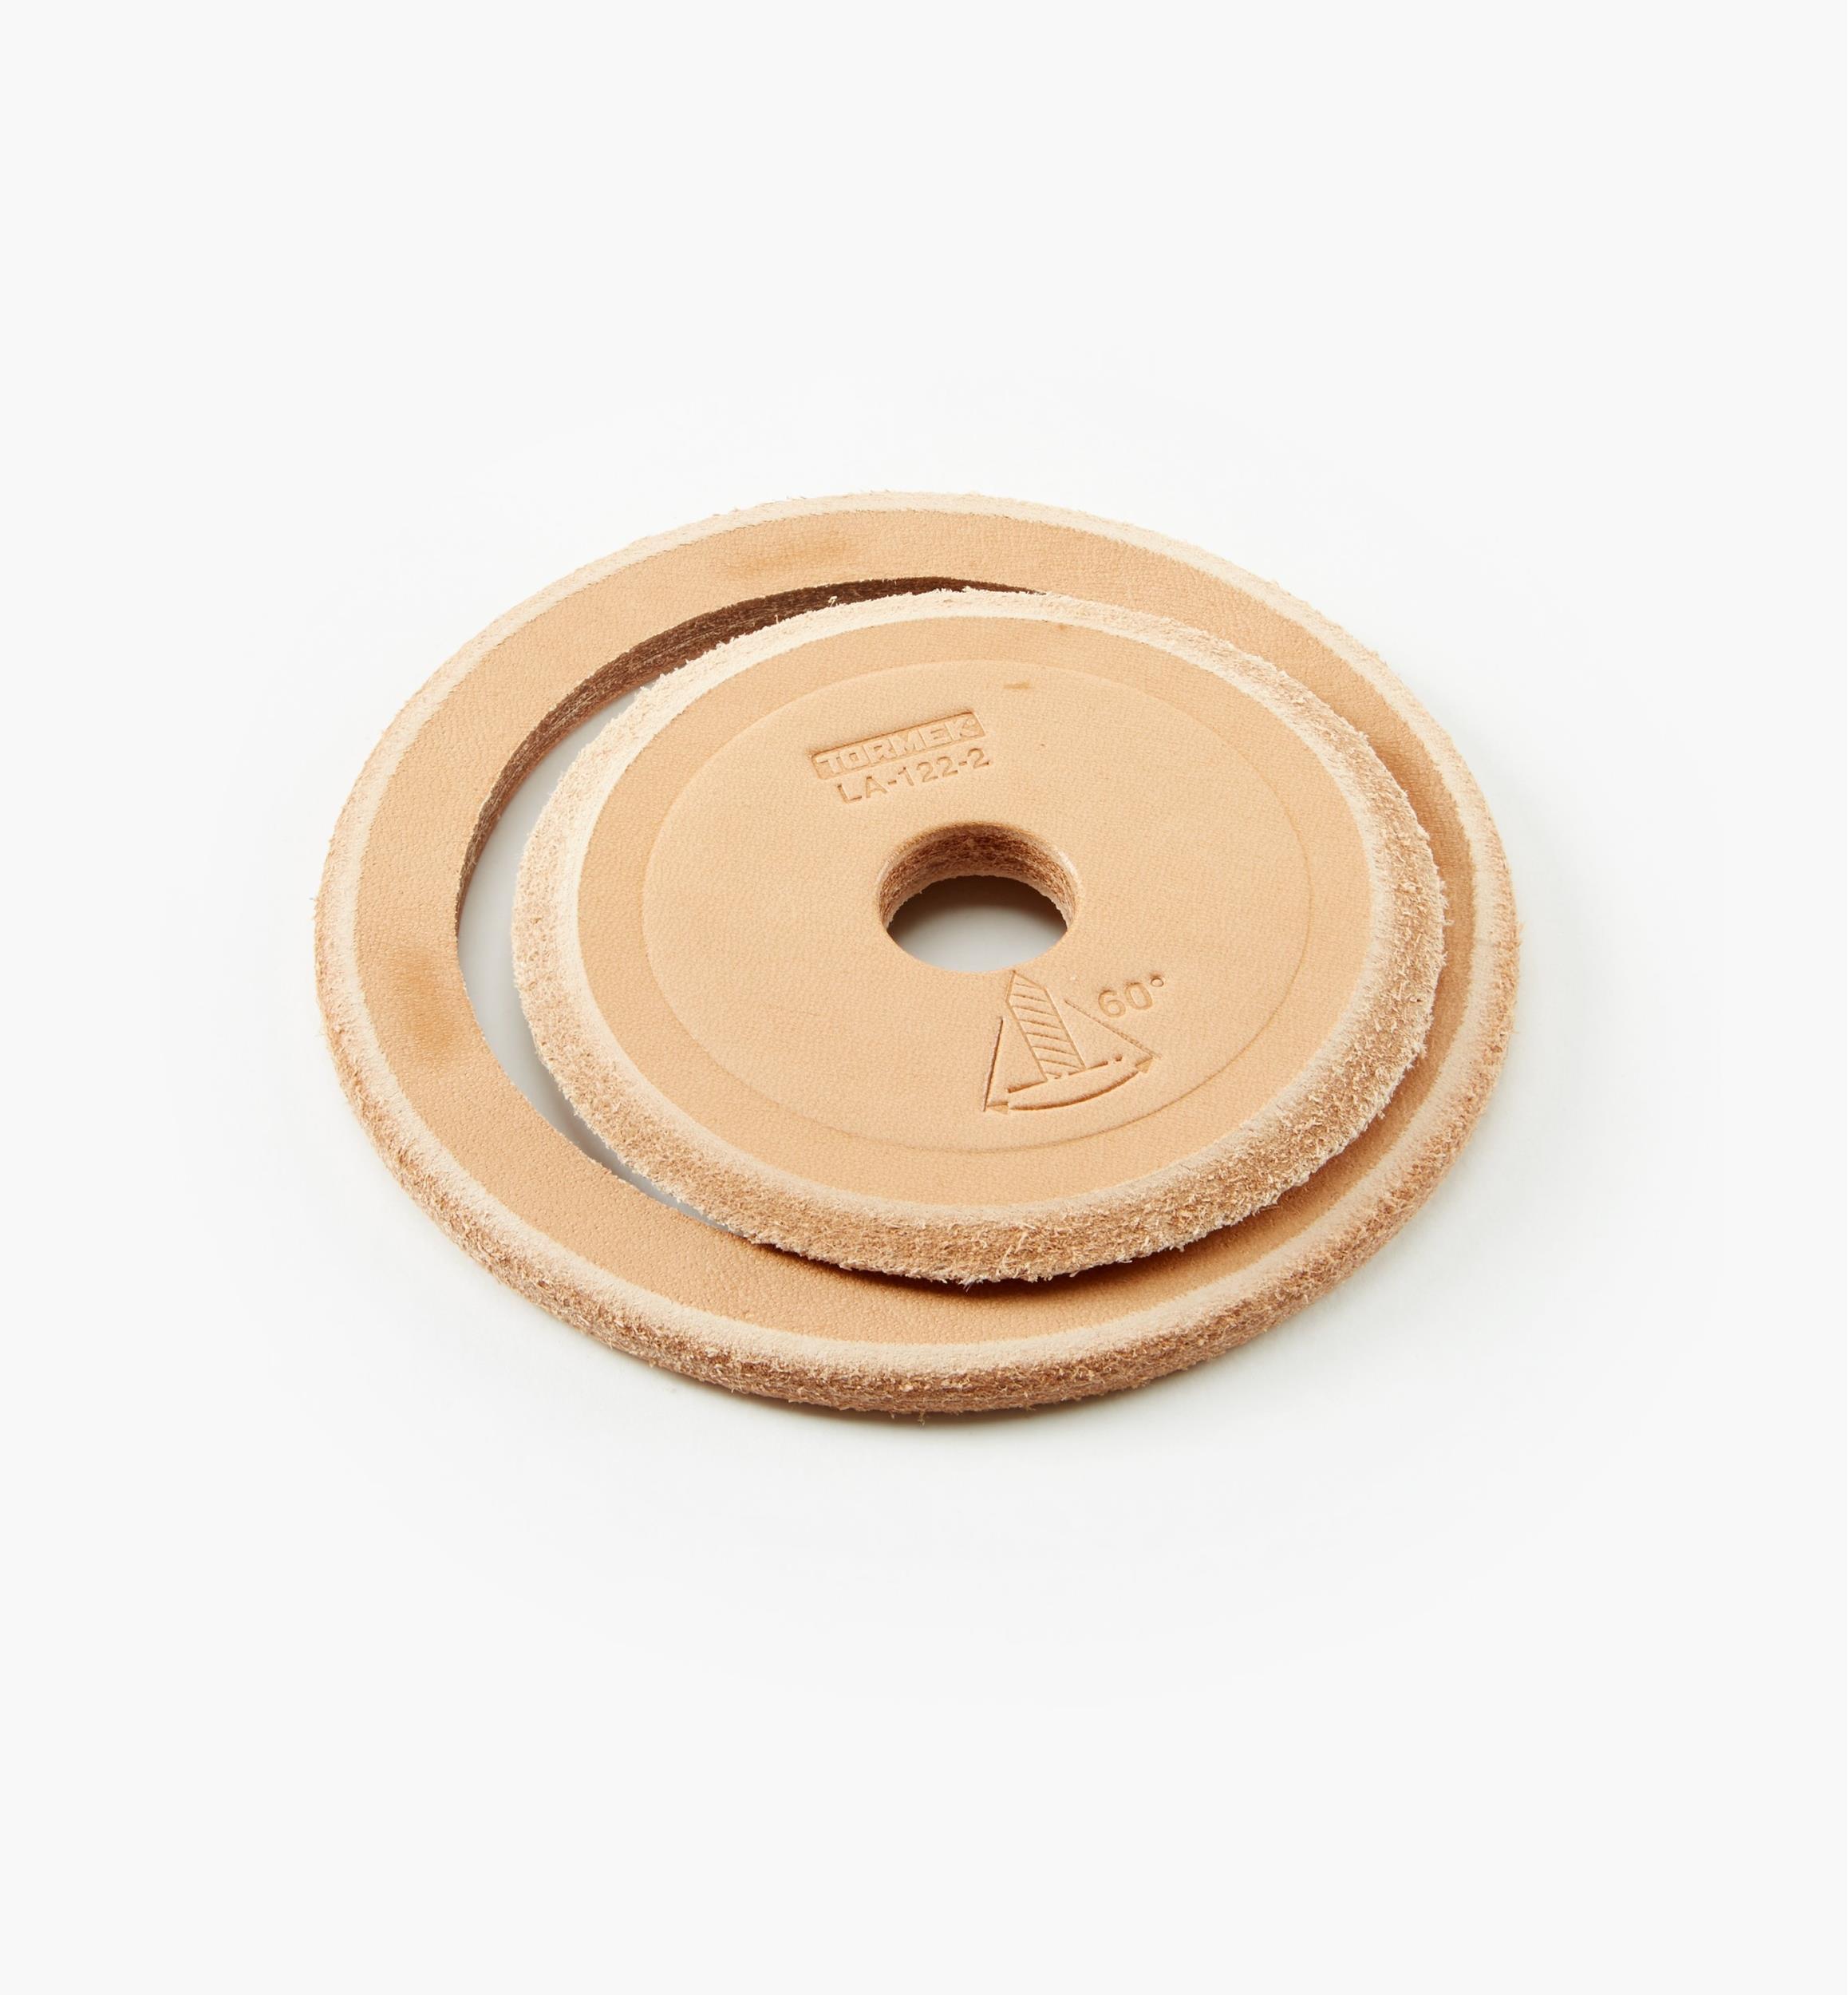 Tormek #TOR-LA120 Profiled Leather Honing Wheel